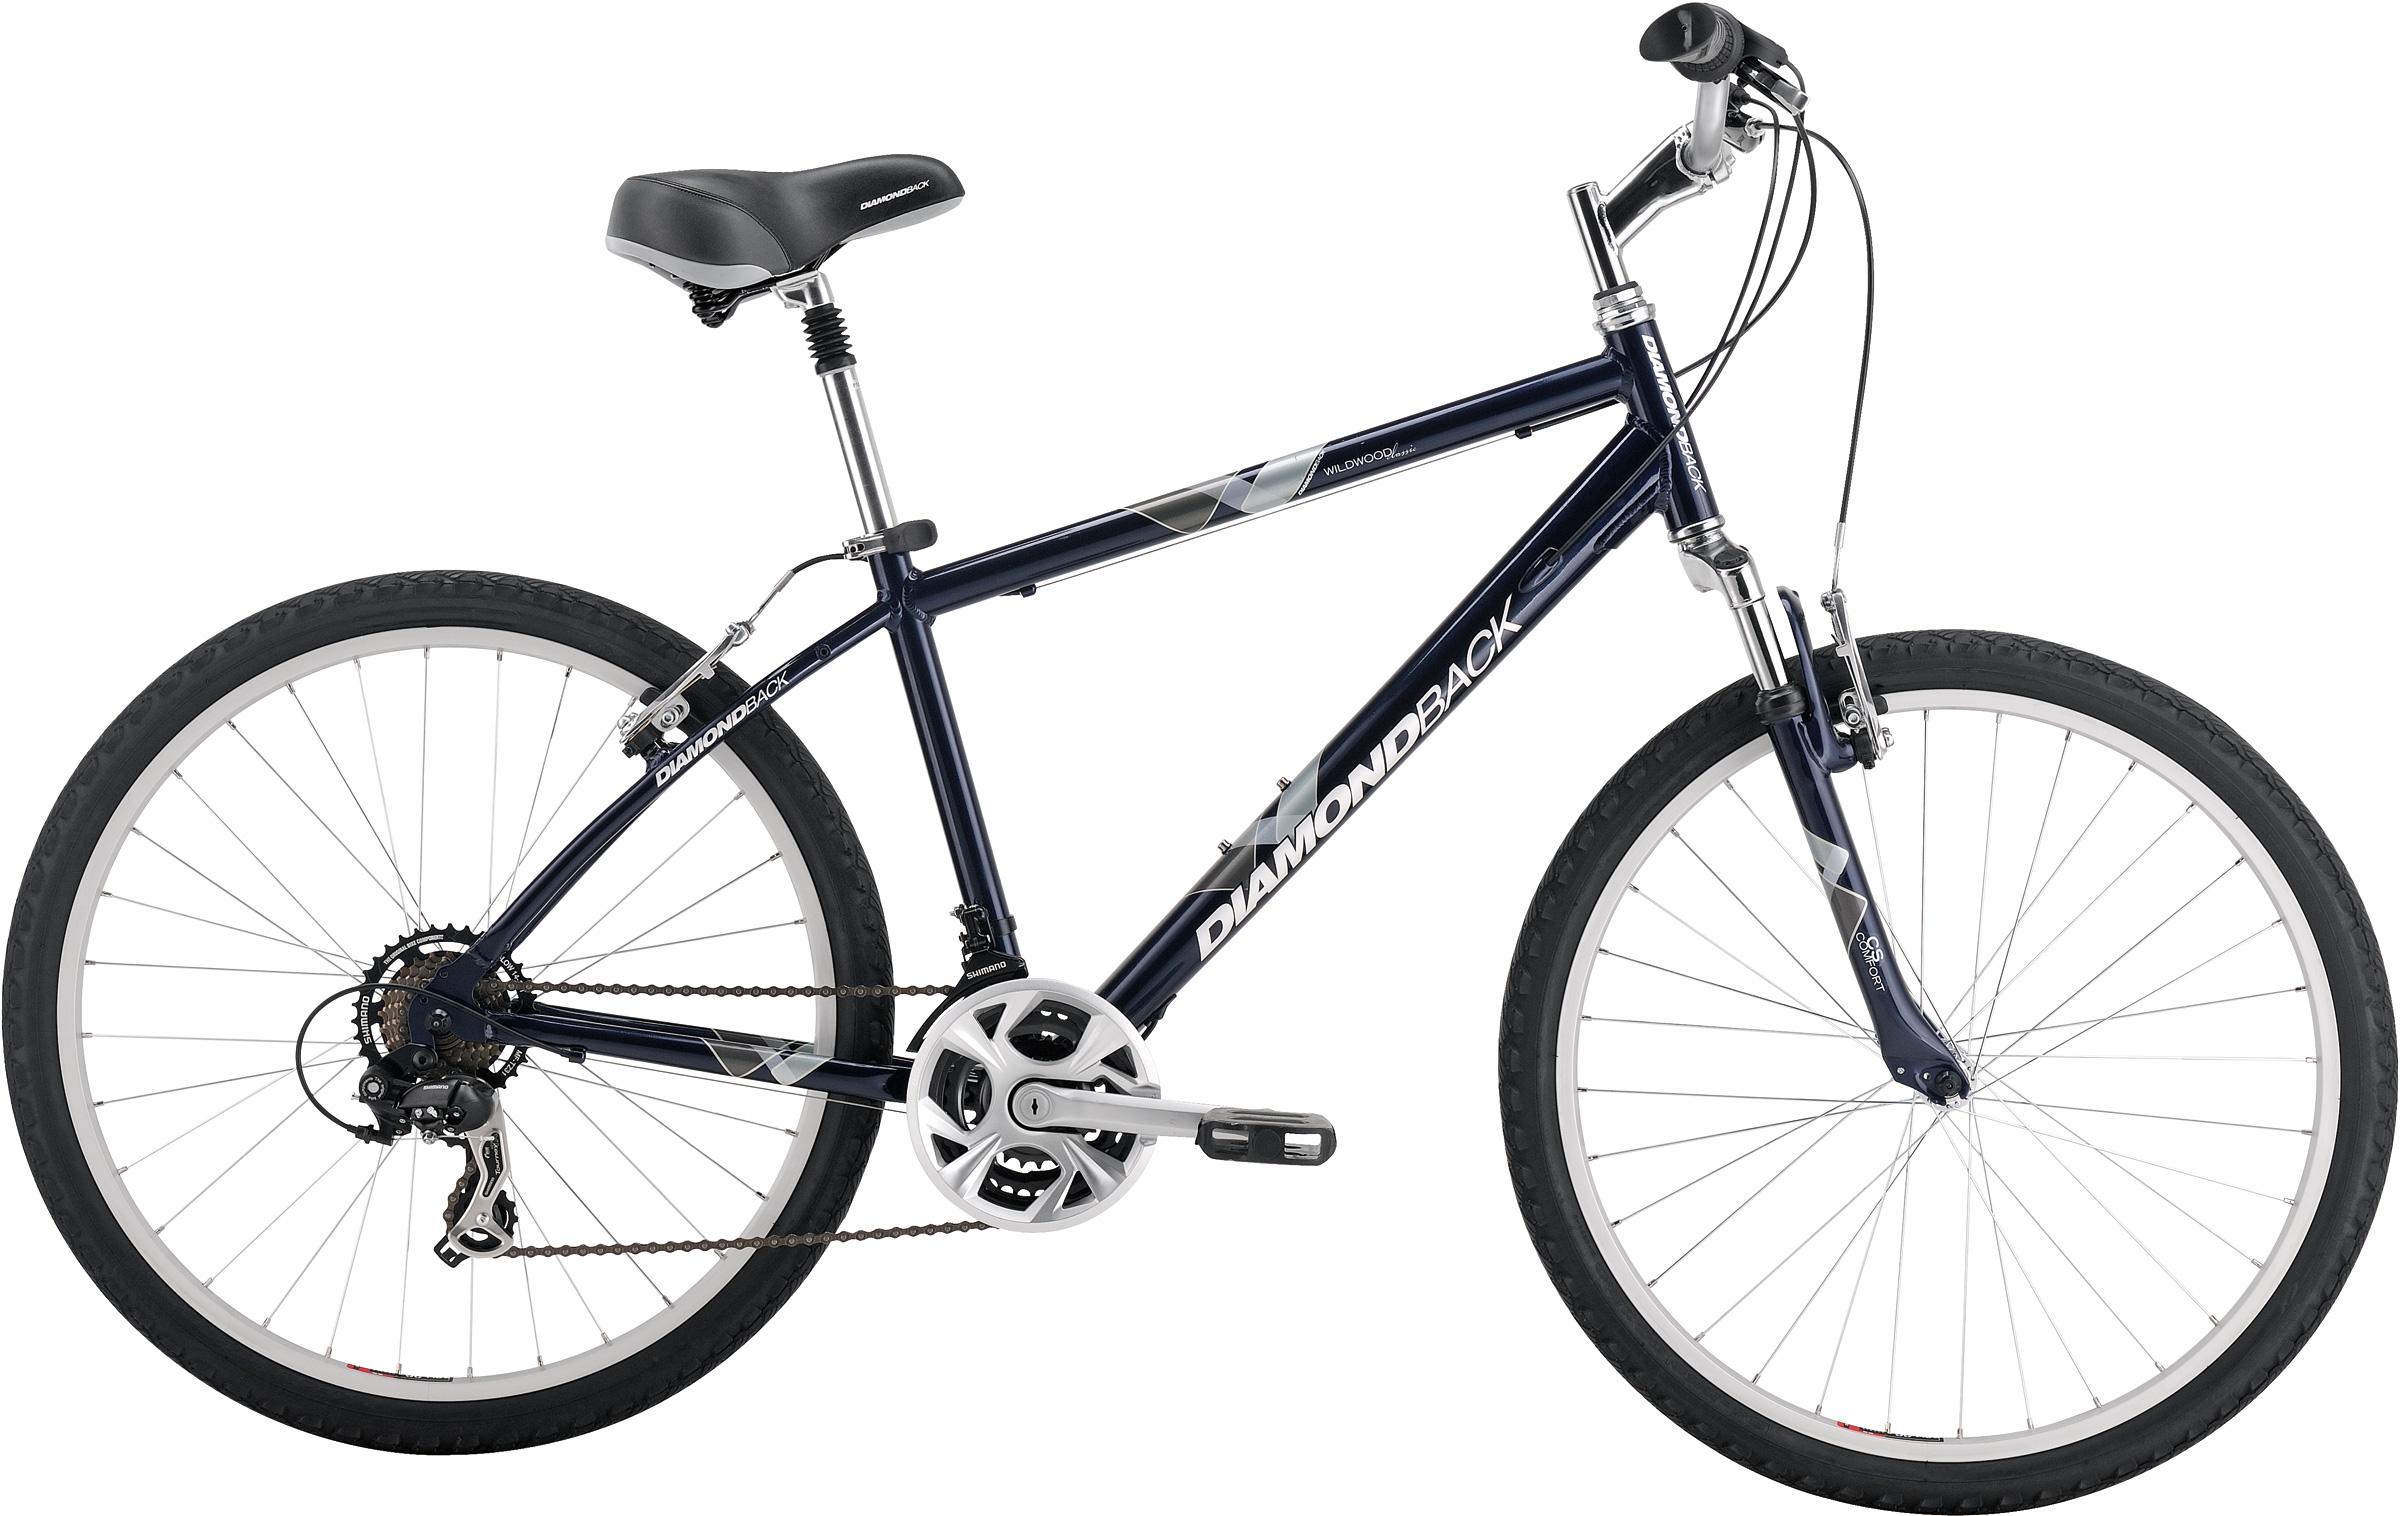 2015 Diamondback Wildwood Classic Bicycle Details Bicyclebluebook Com